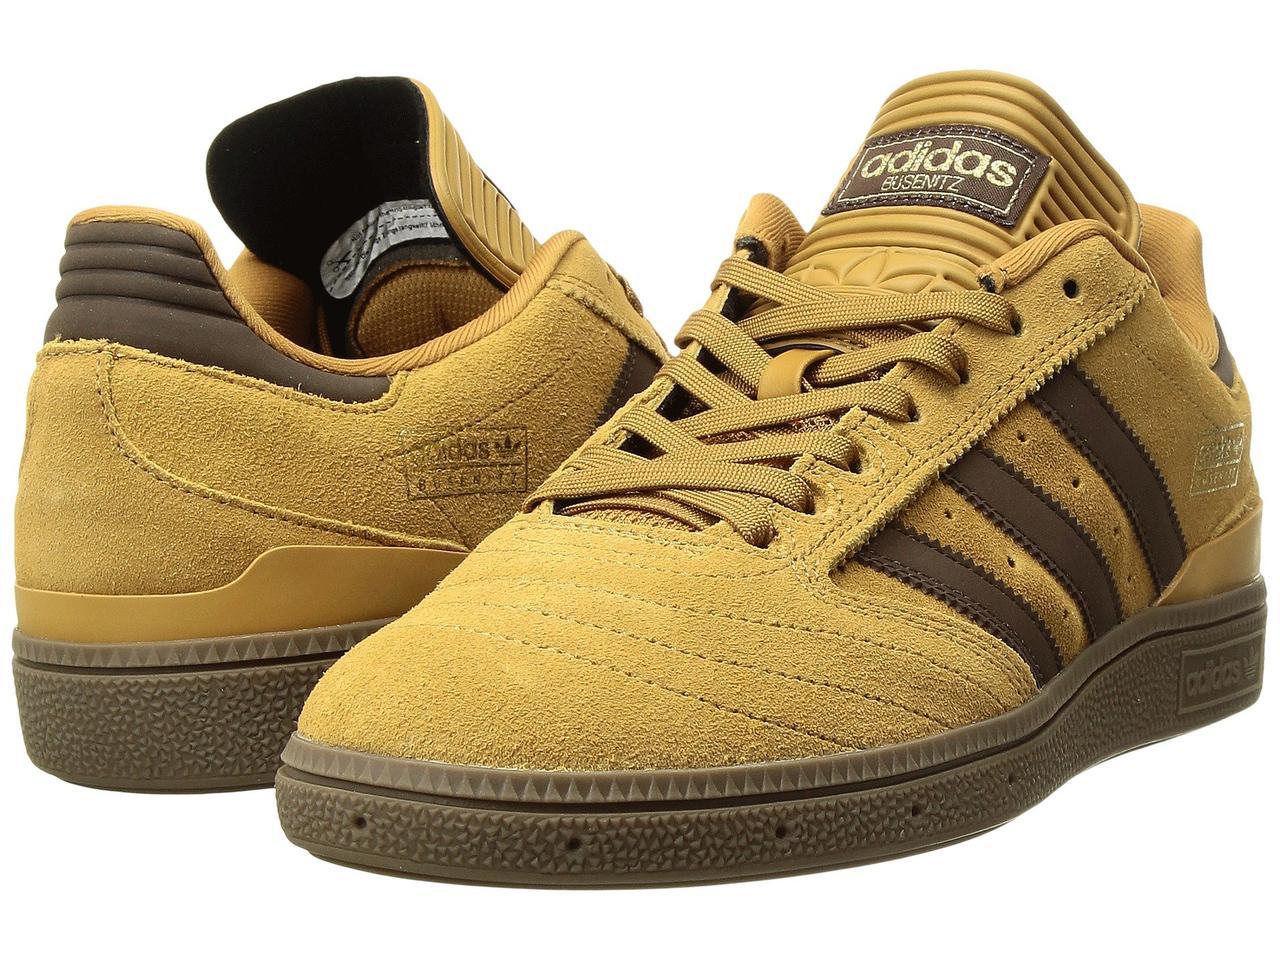 8194c65d789b ... Кроссовки Кеды (Оригинал) adidas Skateboarding Busenitz Pro Mesa Brown  Gold Metallic ...